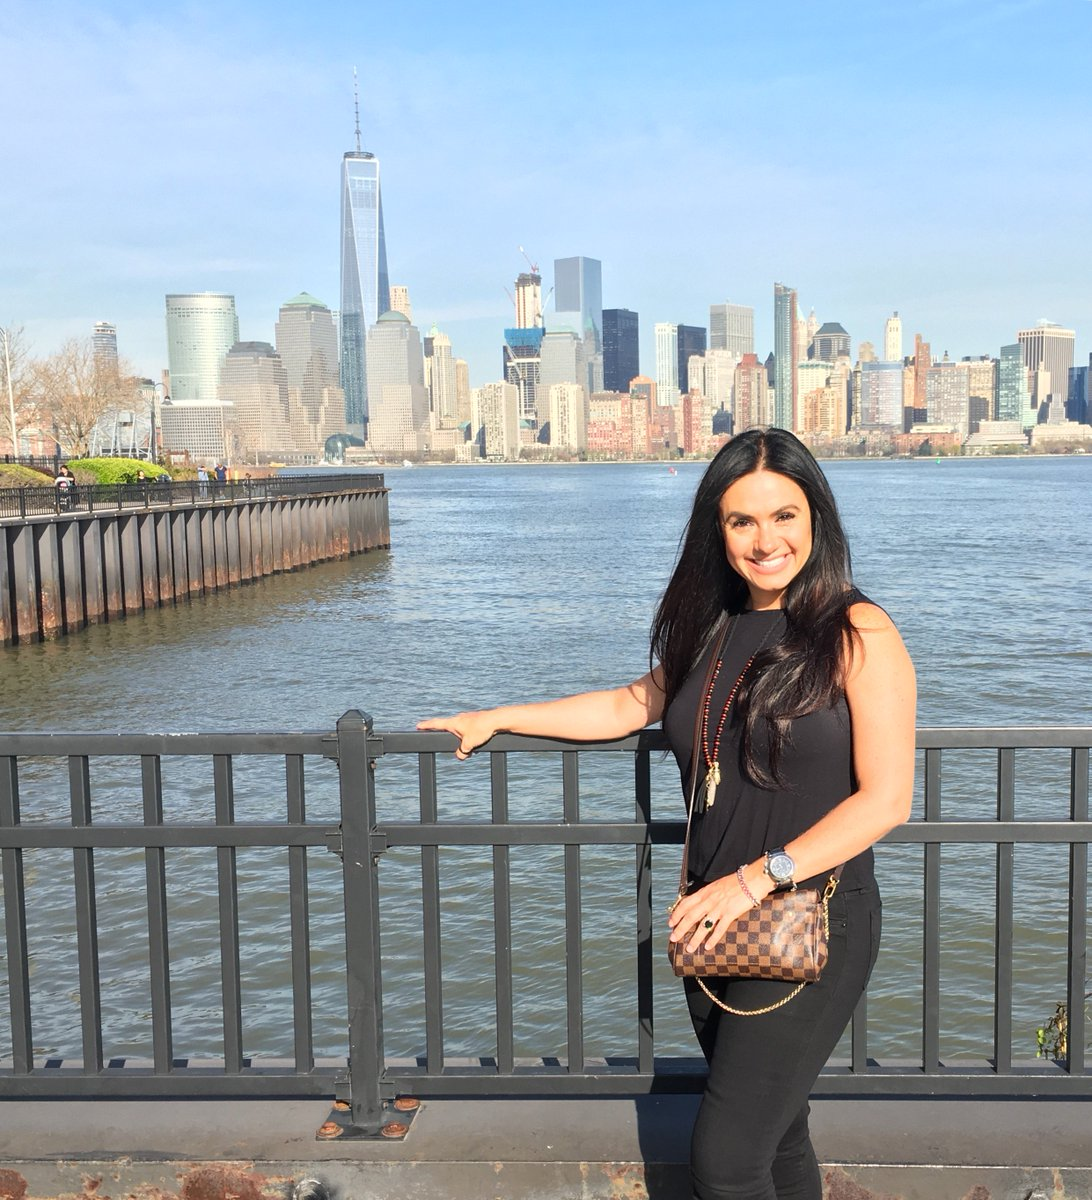 Penelope menchaca on twitter new york httpstovaam7kvgb voltagebd Image collections